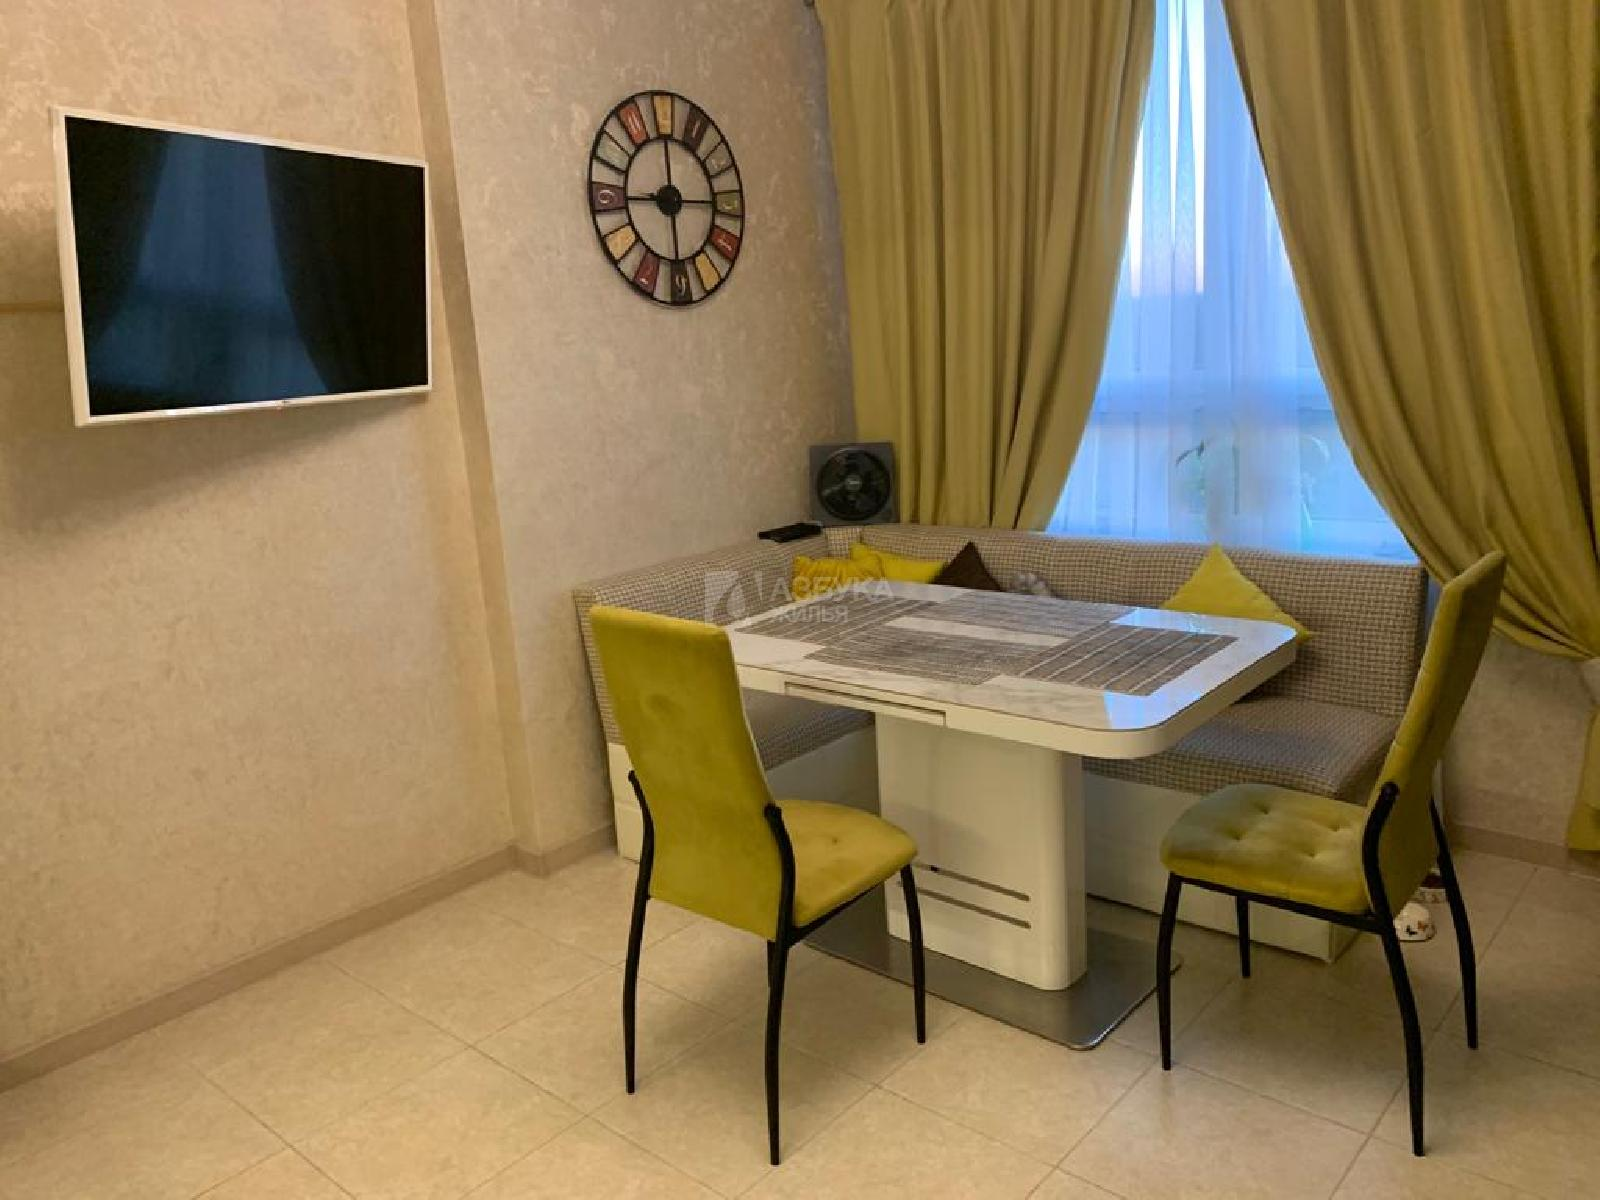 Фото №7 - 3-комнатная квартира, Москва, Поляны улица 5, метро Улица Скобелевская